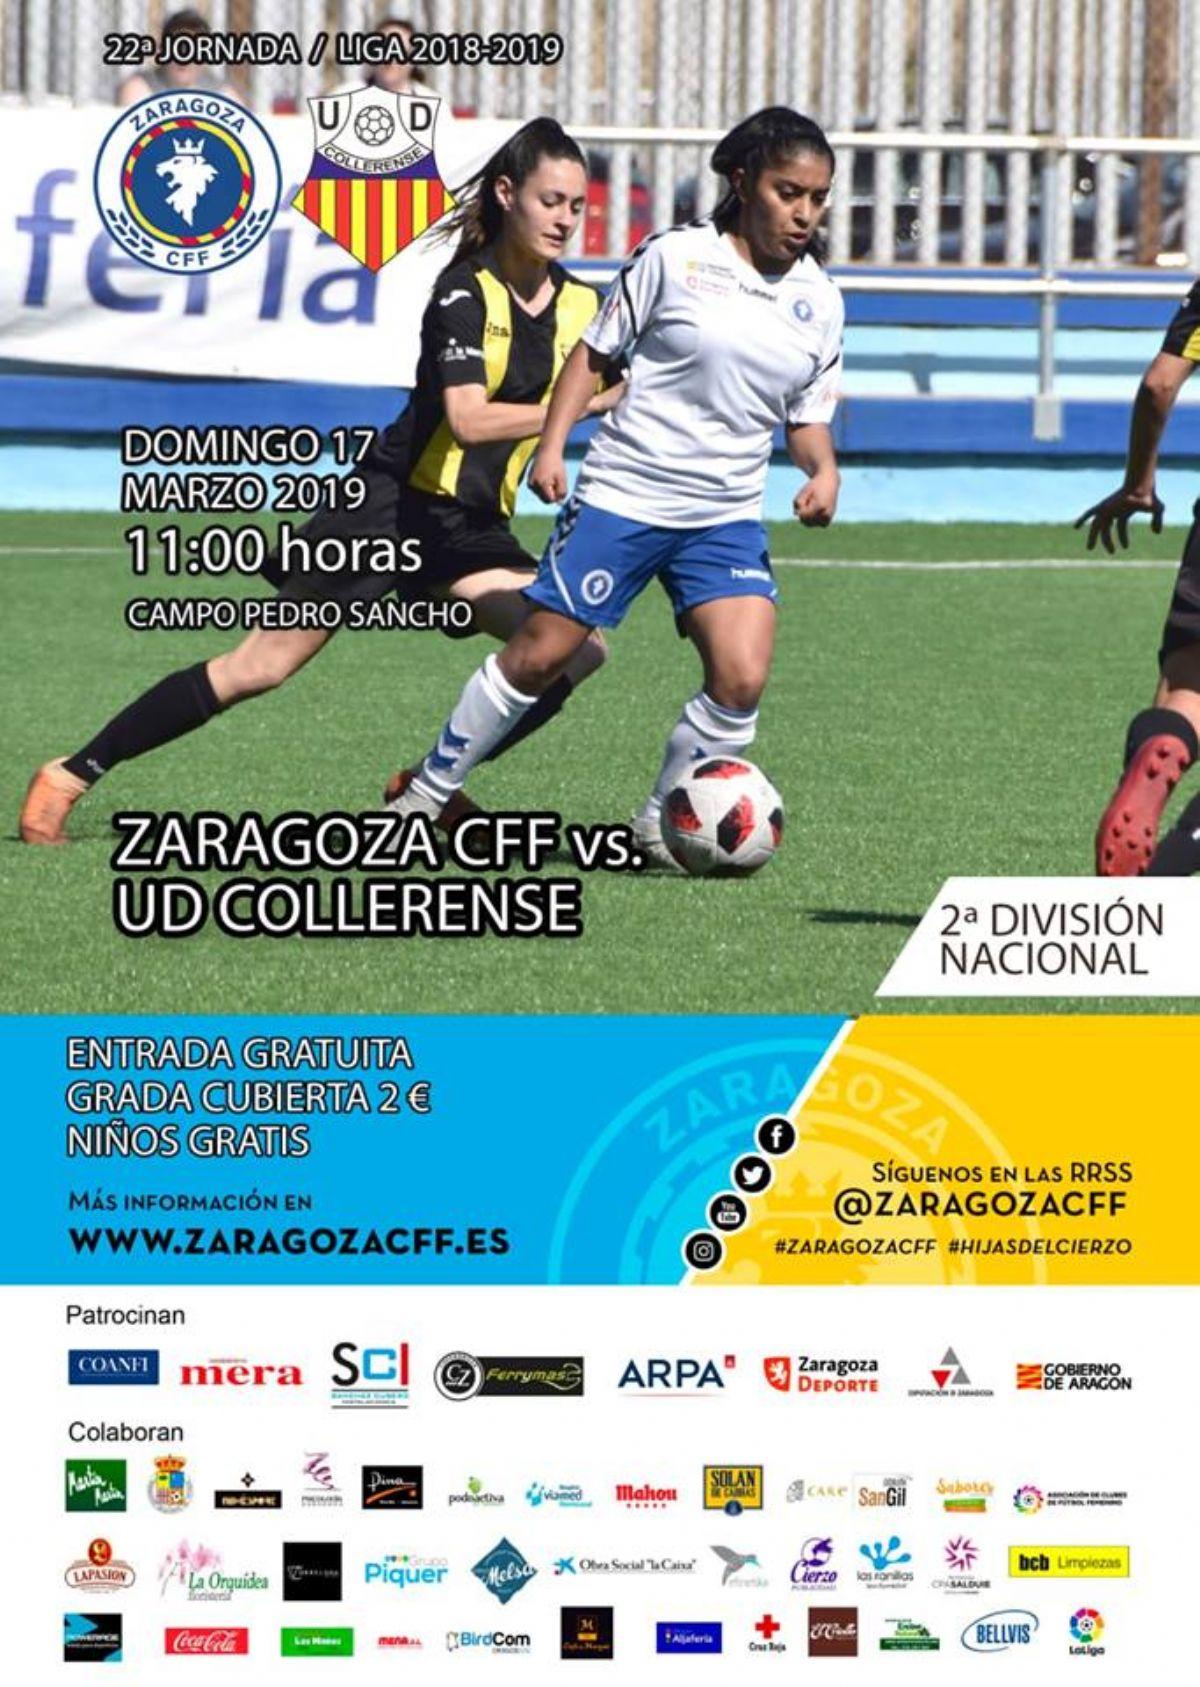 Zaragoza Club De Fútbol Femenino - U.D. Collerense